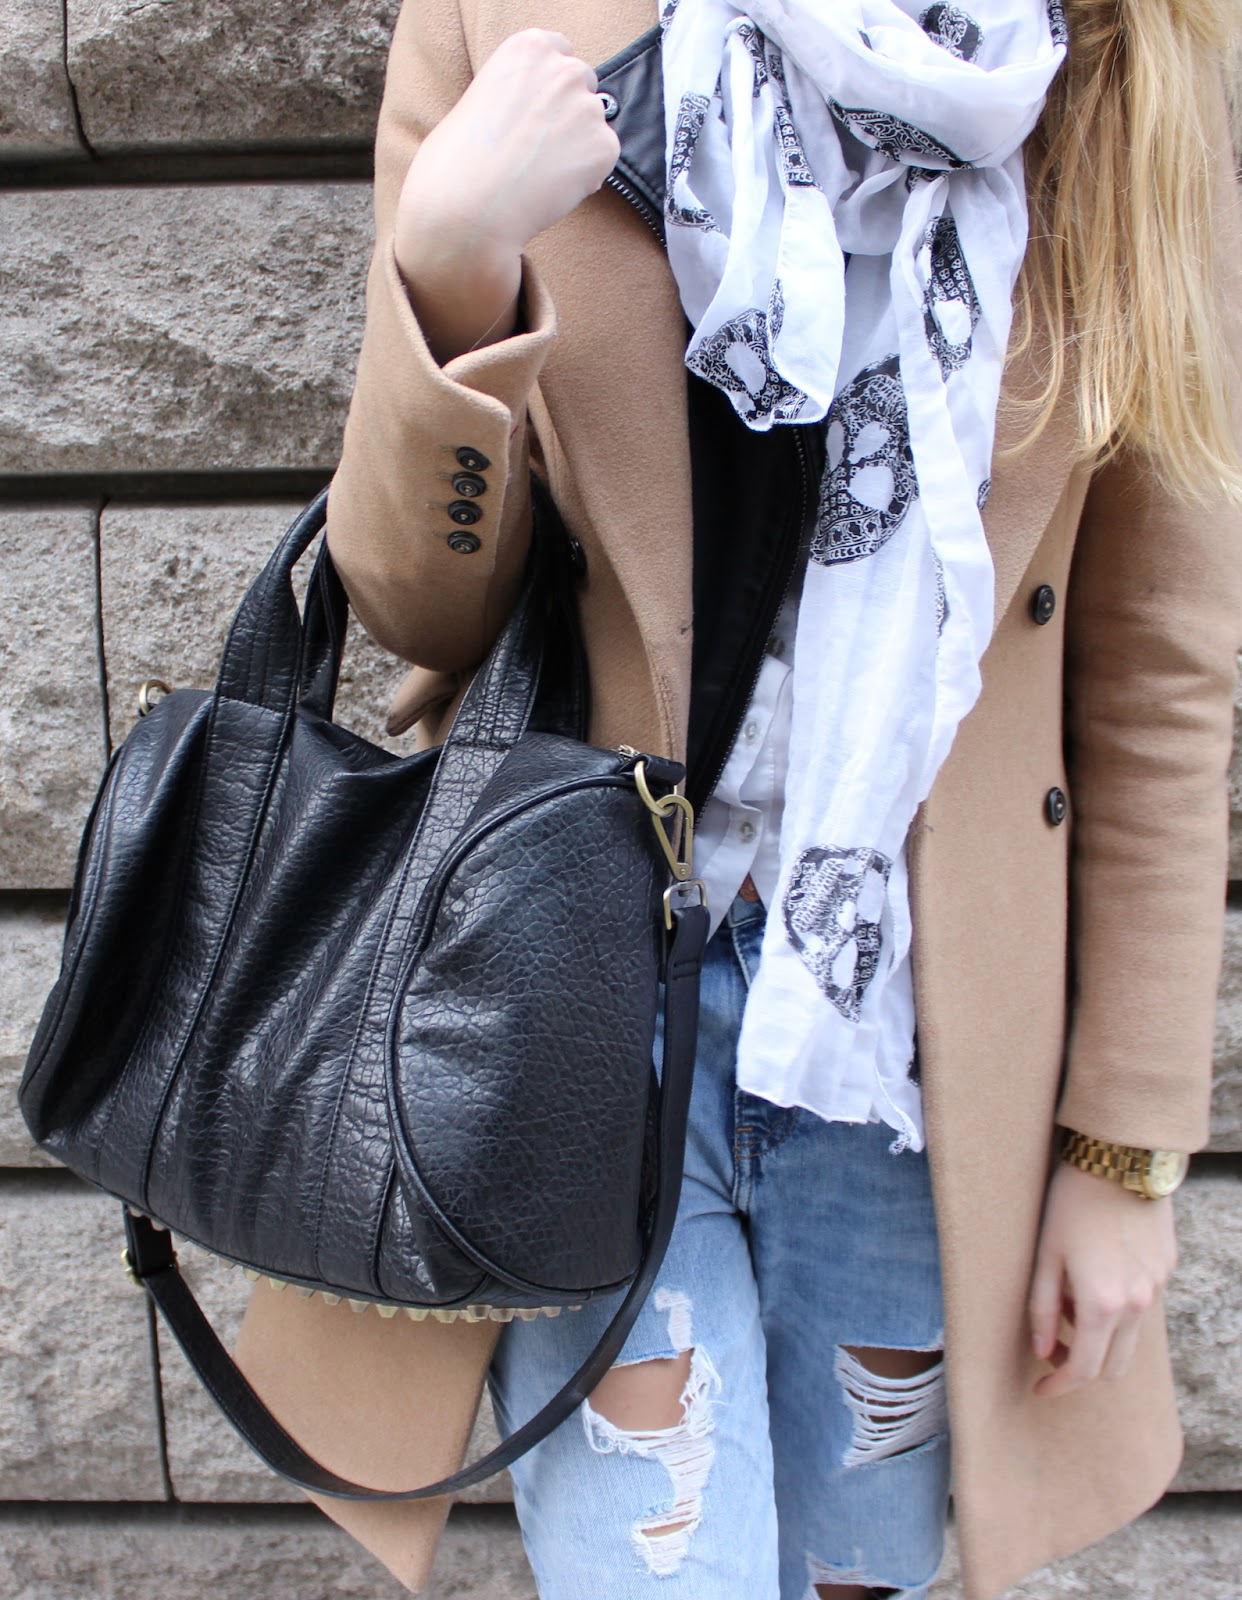 TheBlondeLion Boyfriend Jeans Camel http://theblondelion.blogspot.com/2014/12/look-casual-in-camel.html